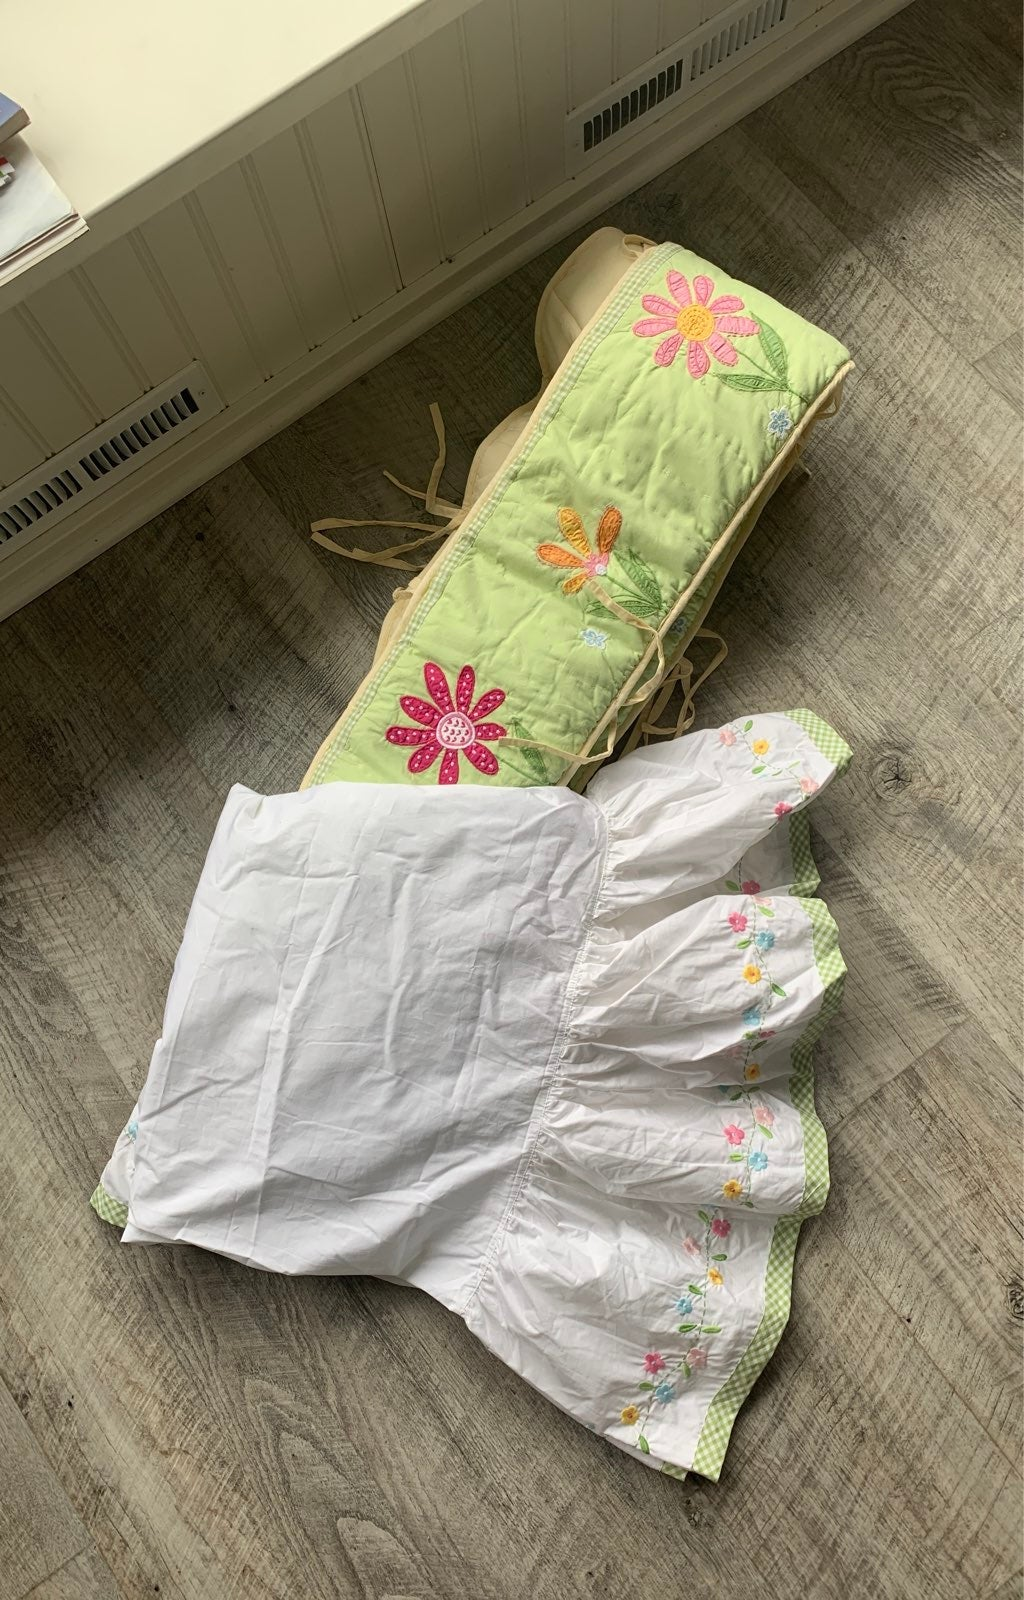 Pottery barn kids crib skirt/bumper pad